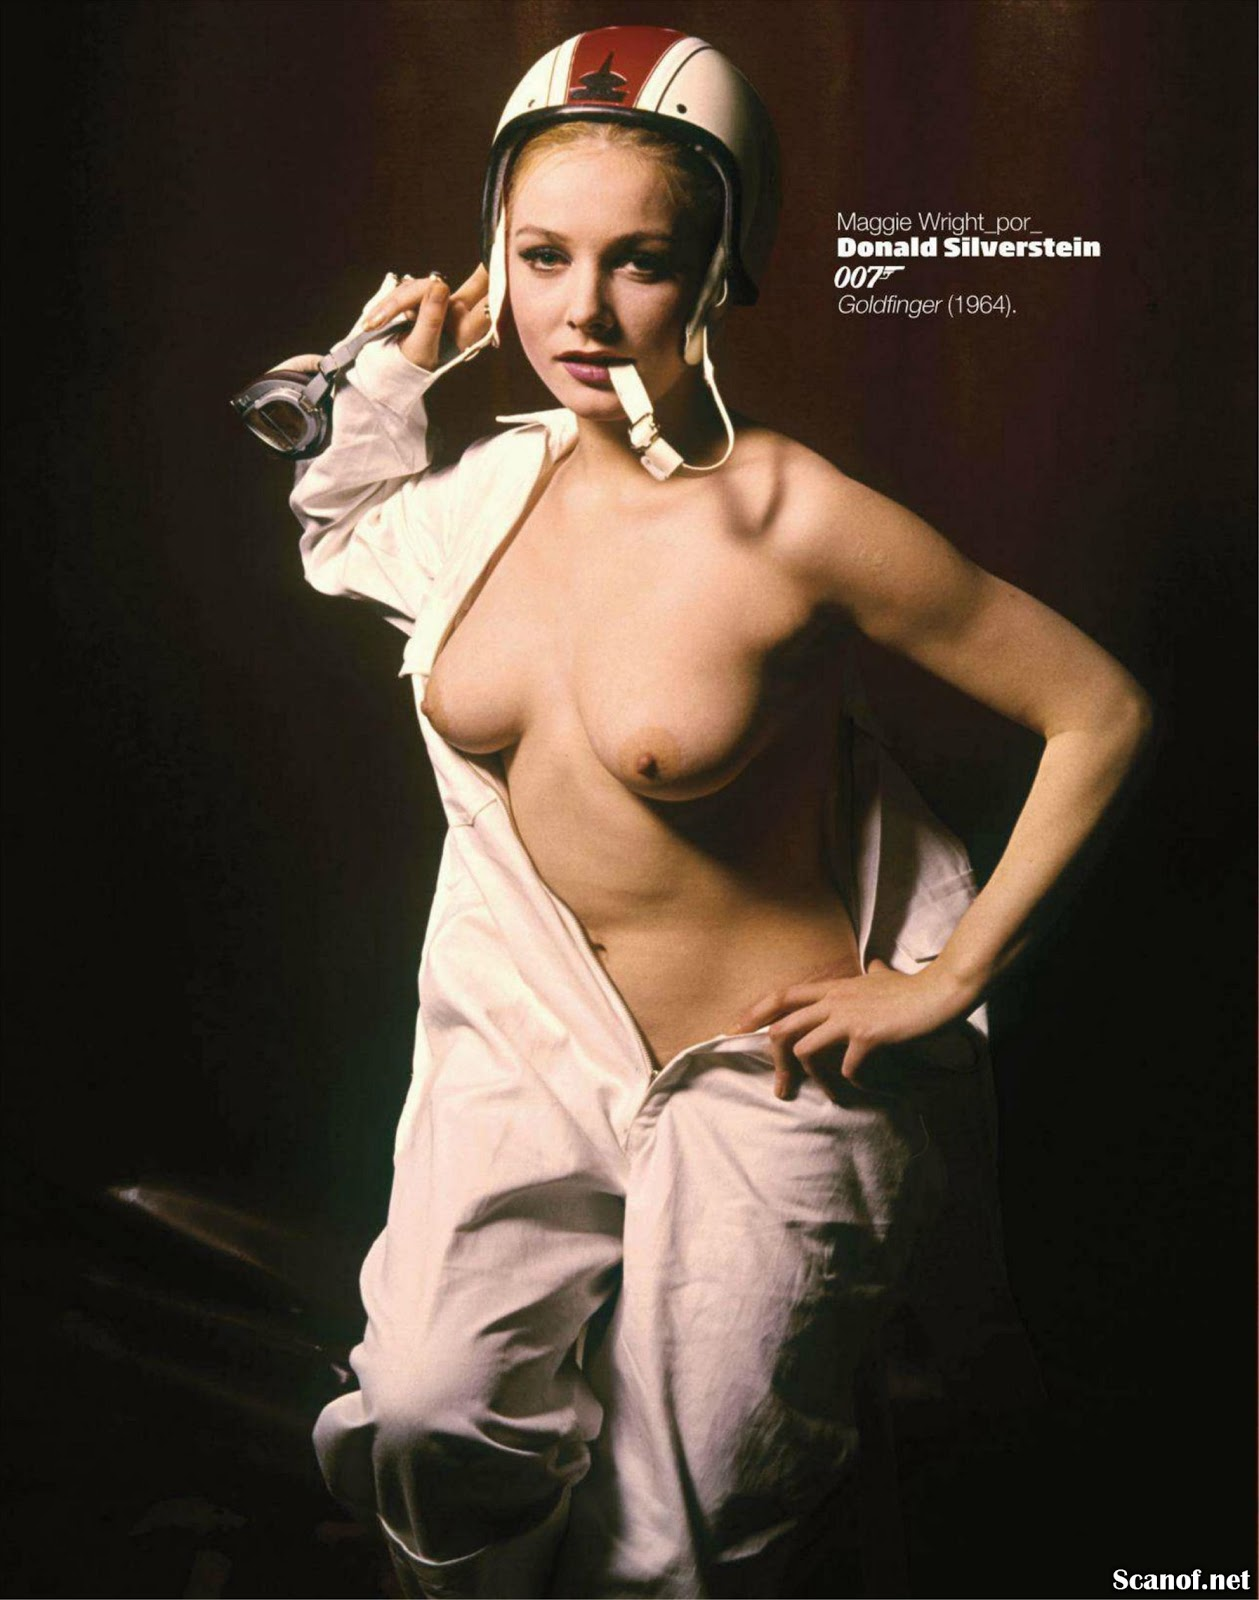 http://3.bp.blogspot.com/-49LLZji5OVE/UKVgbn0f_zI/AAAAAAAAt5k/4jOOSvb4ki8/s1600/Playboy_11-2012_Argentina_Scanof.net_052.jpg